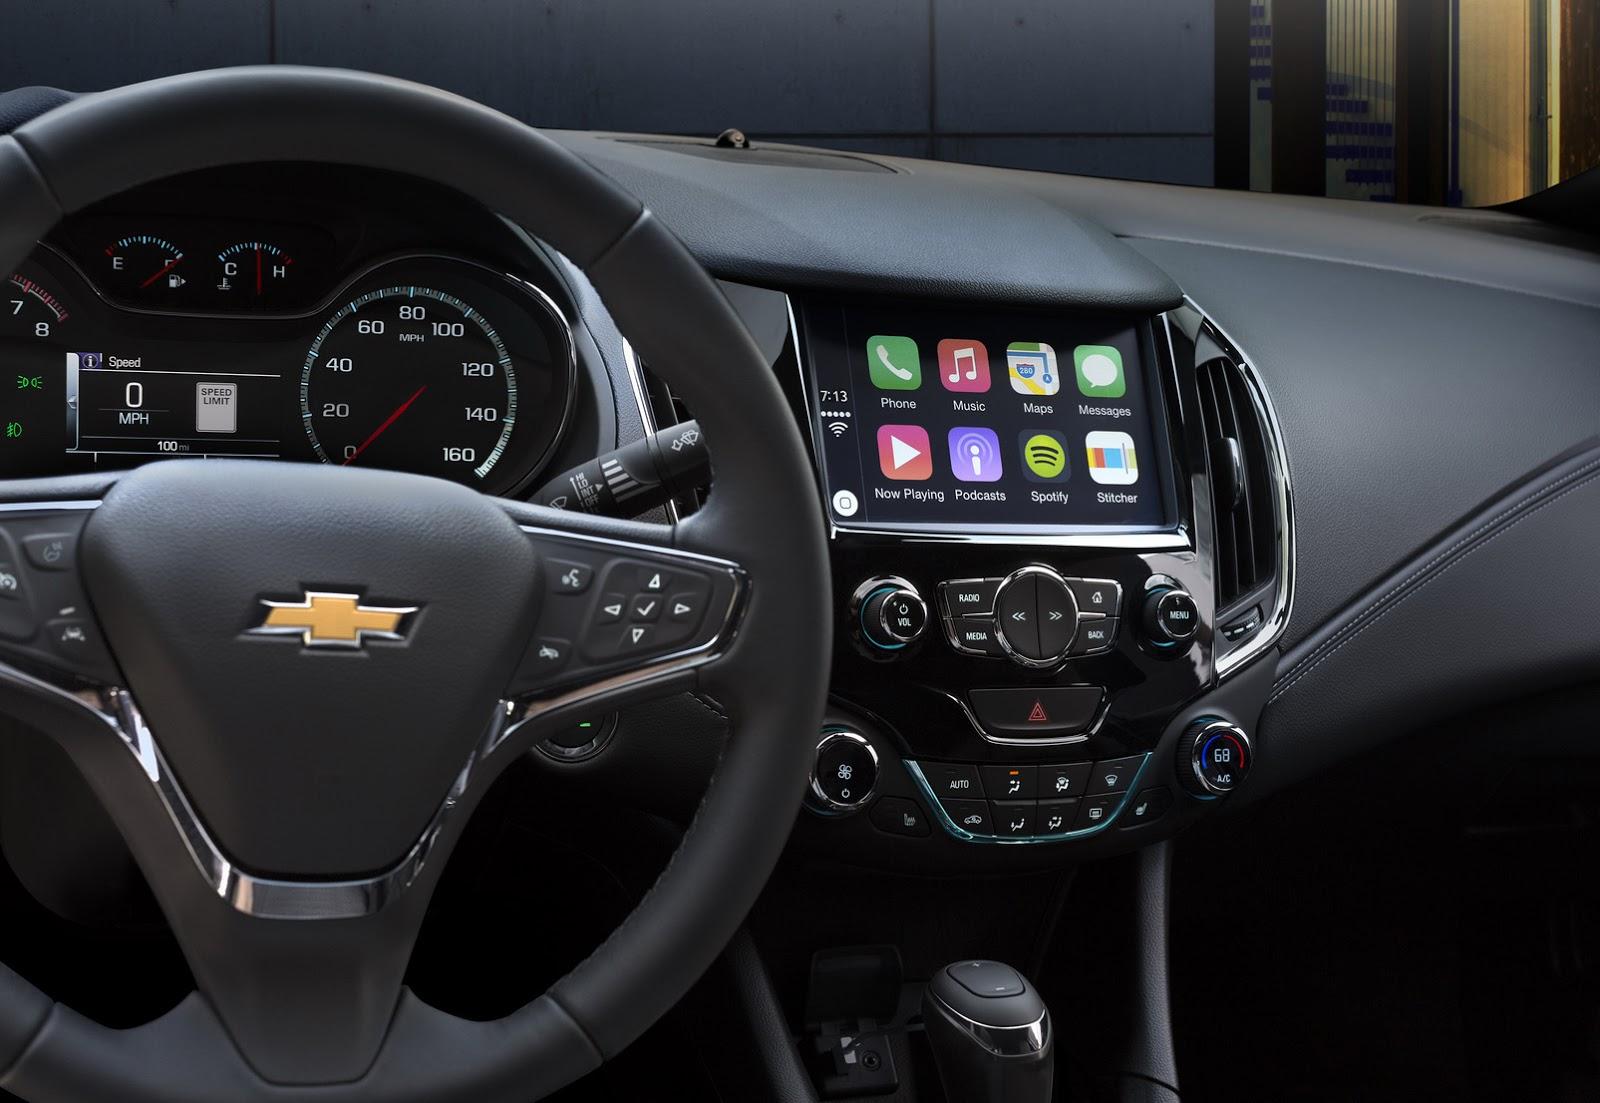 2016 Chevrolet Cruze infotainment official image